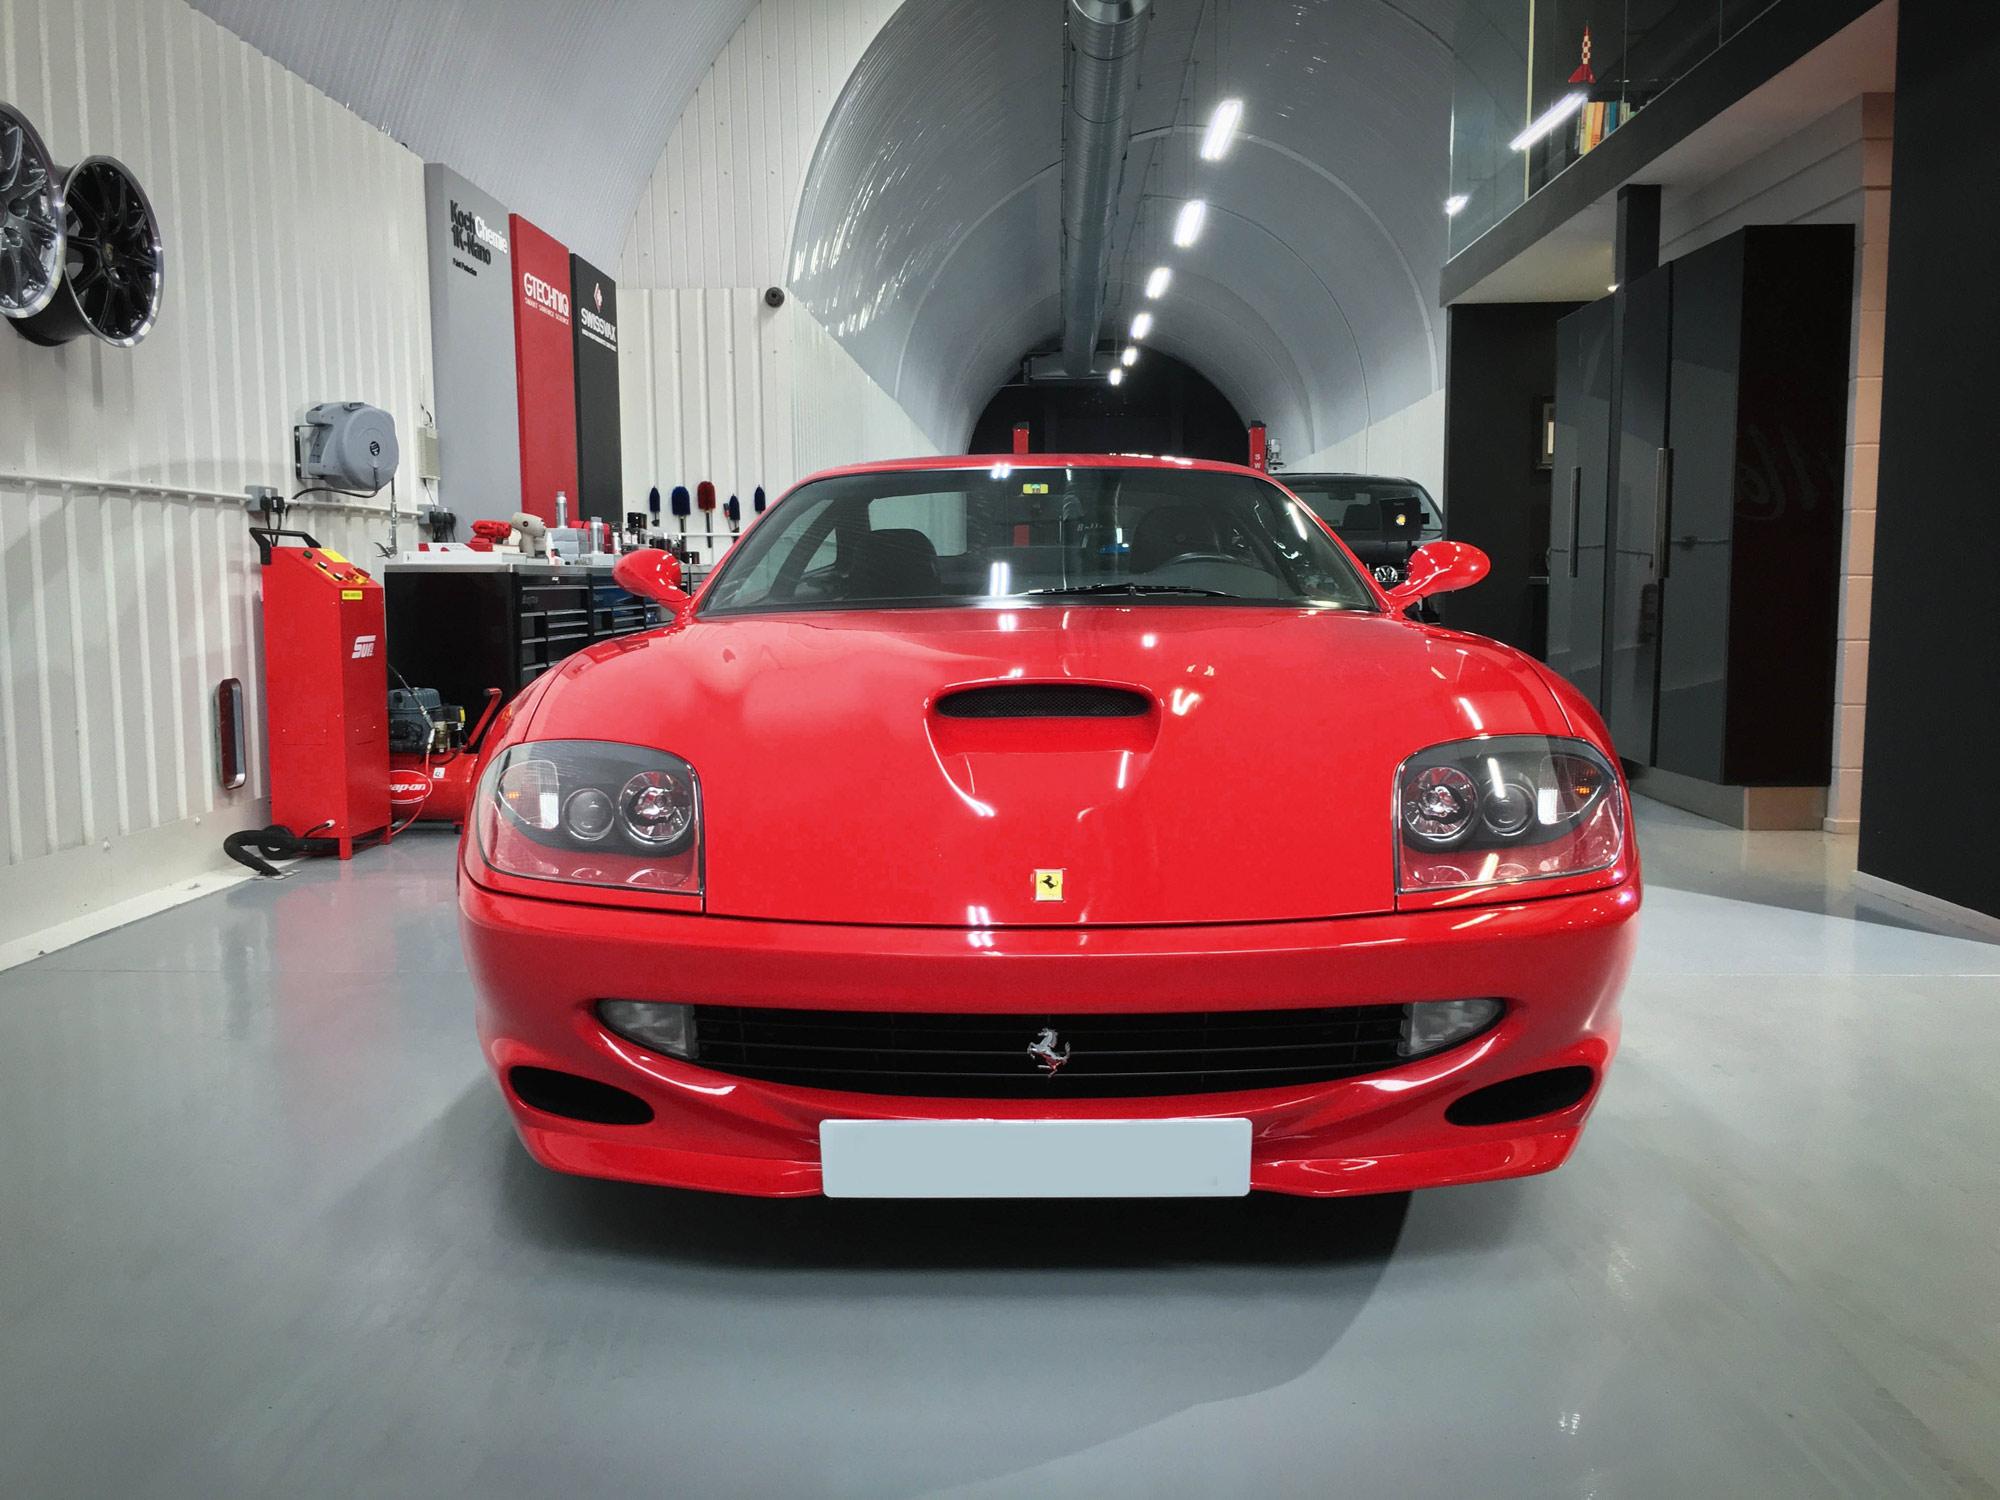 Ferrari_550_Maranello-head-on